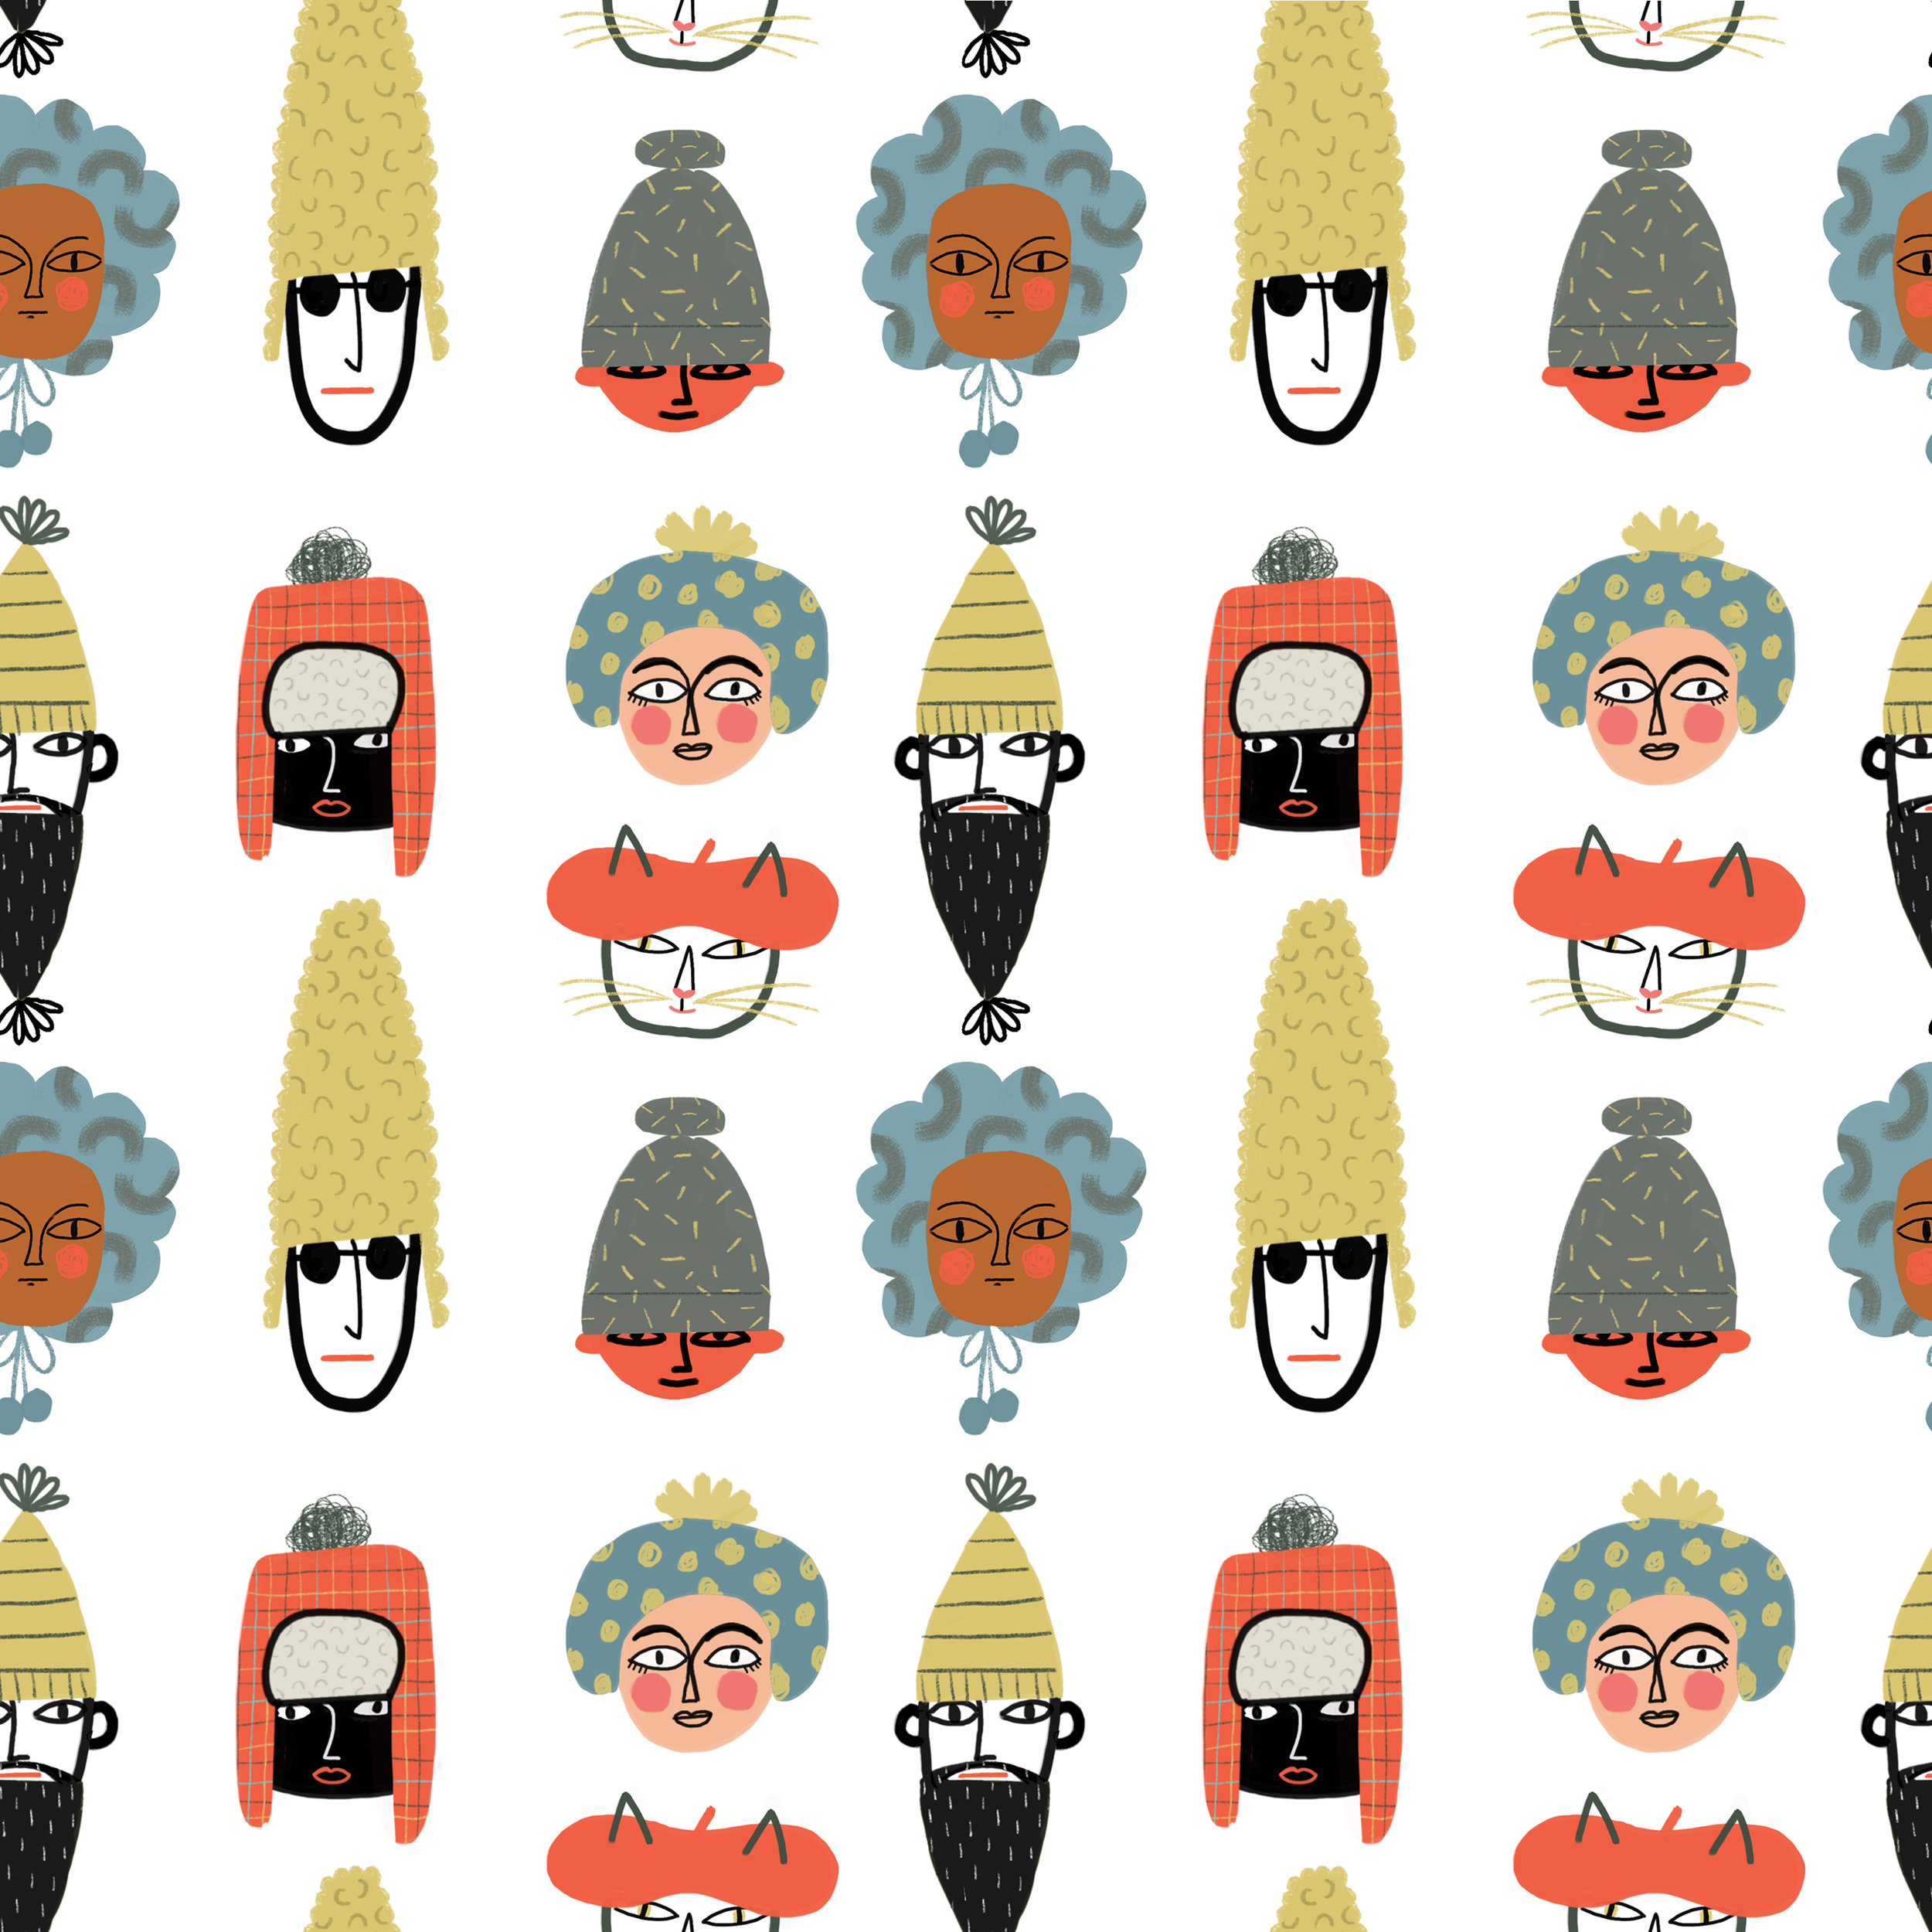 Hats-small copy.jpg